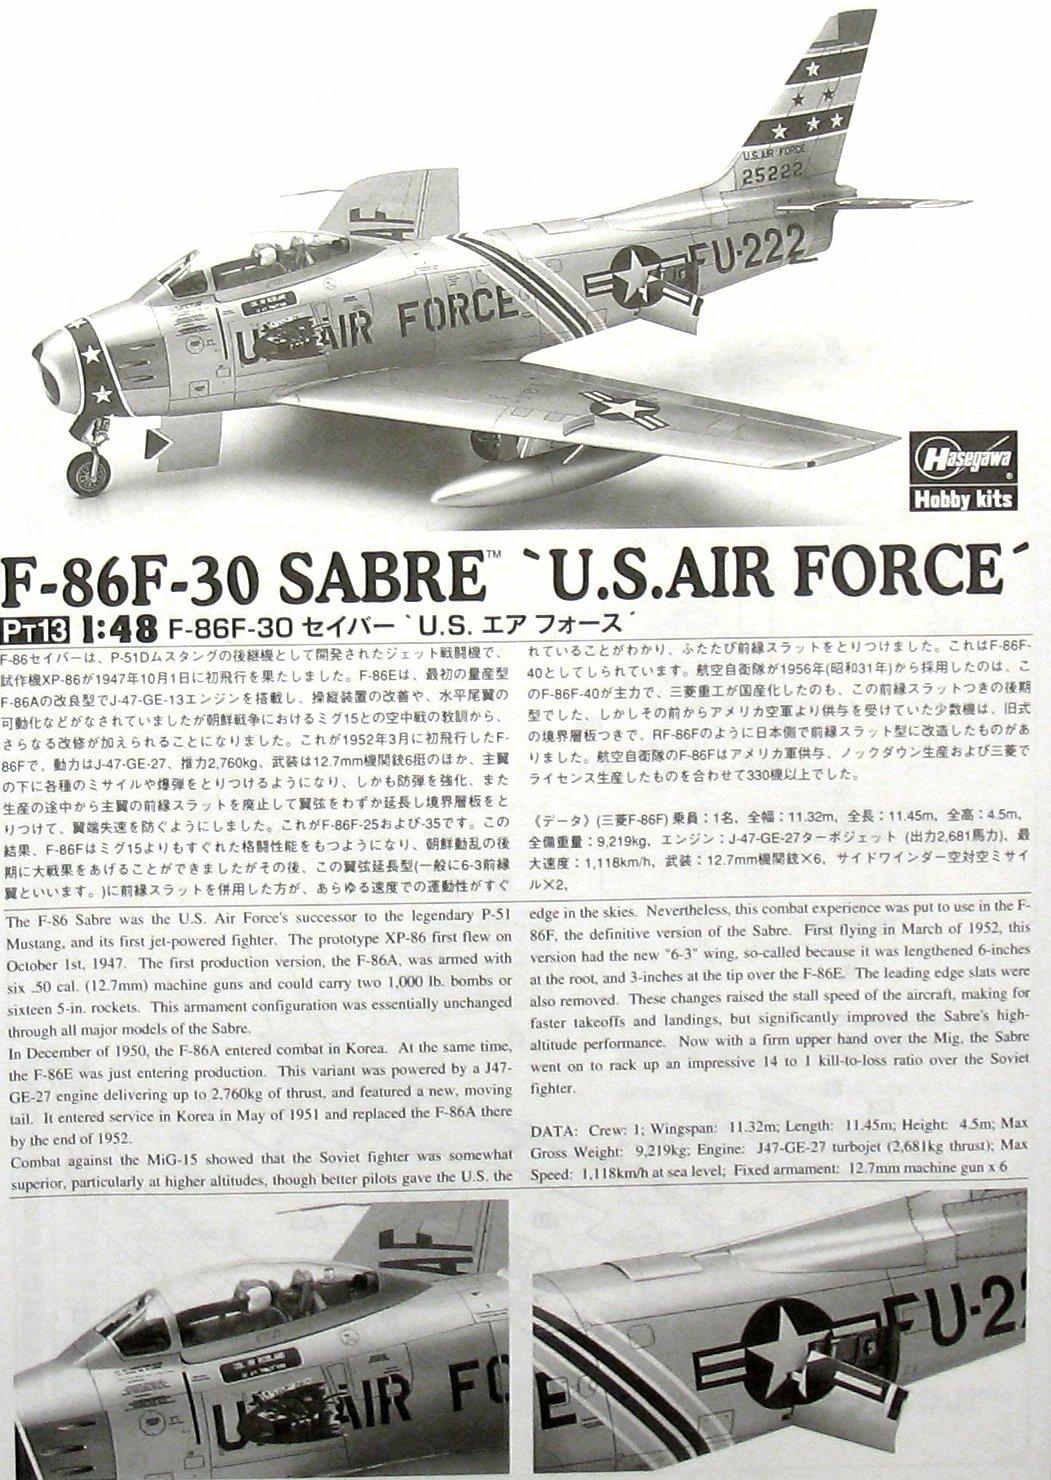 Type 97 Carrier Attack Bomber Model 3 Hasegawa 09076 Nakajima B5N2 1//48 Scale Aircraft Model Kit Kate